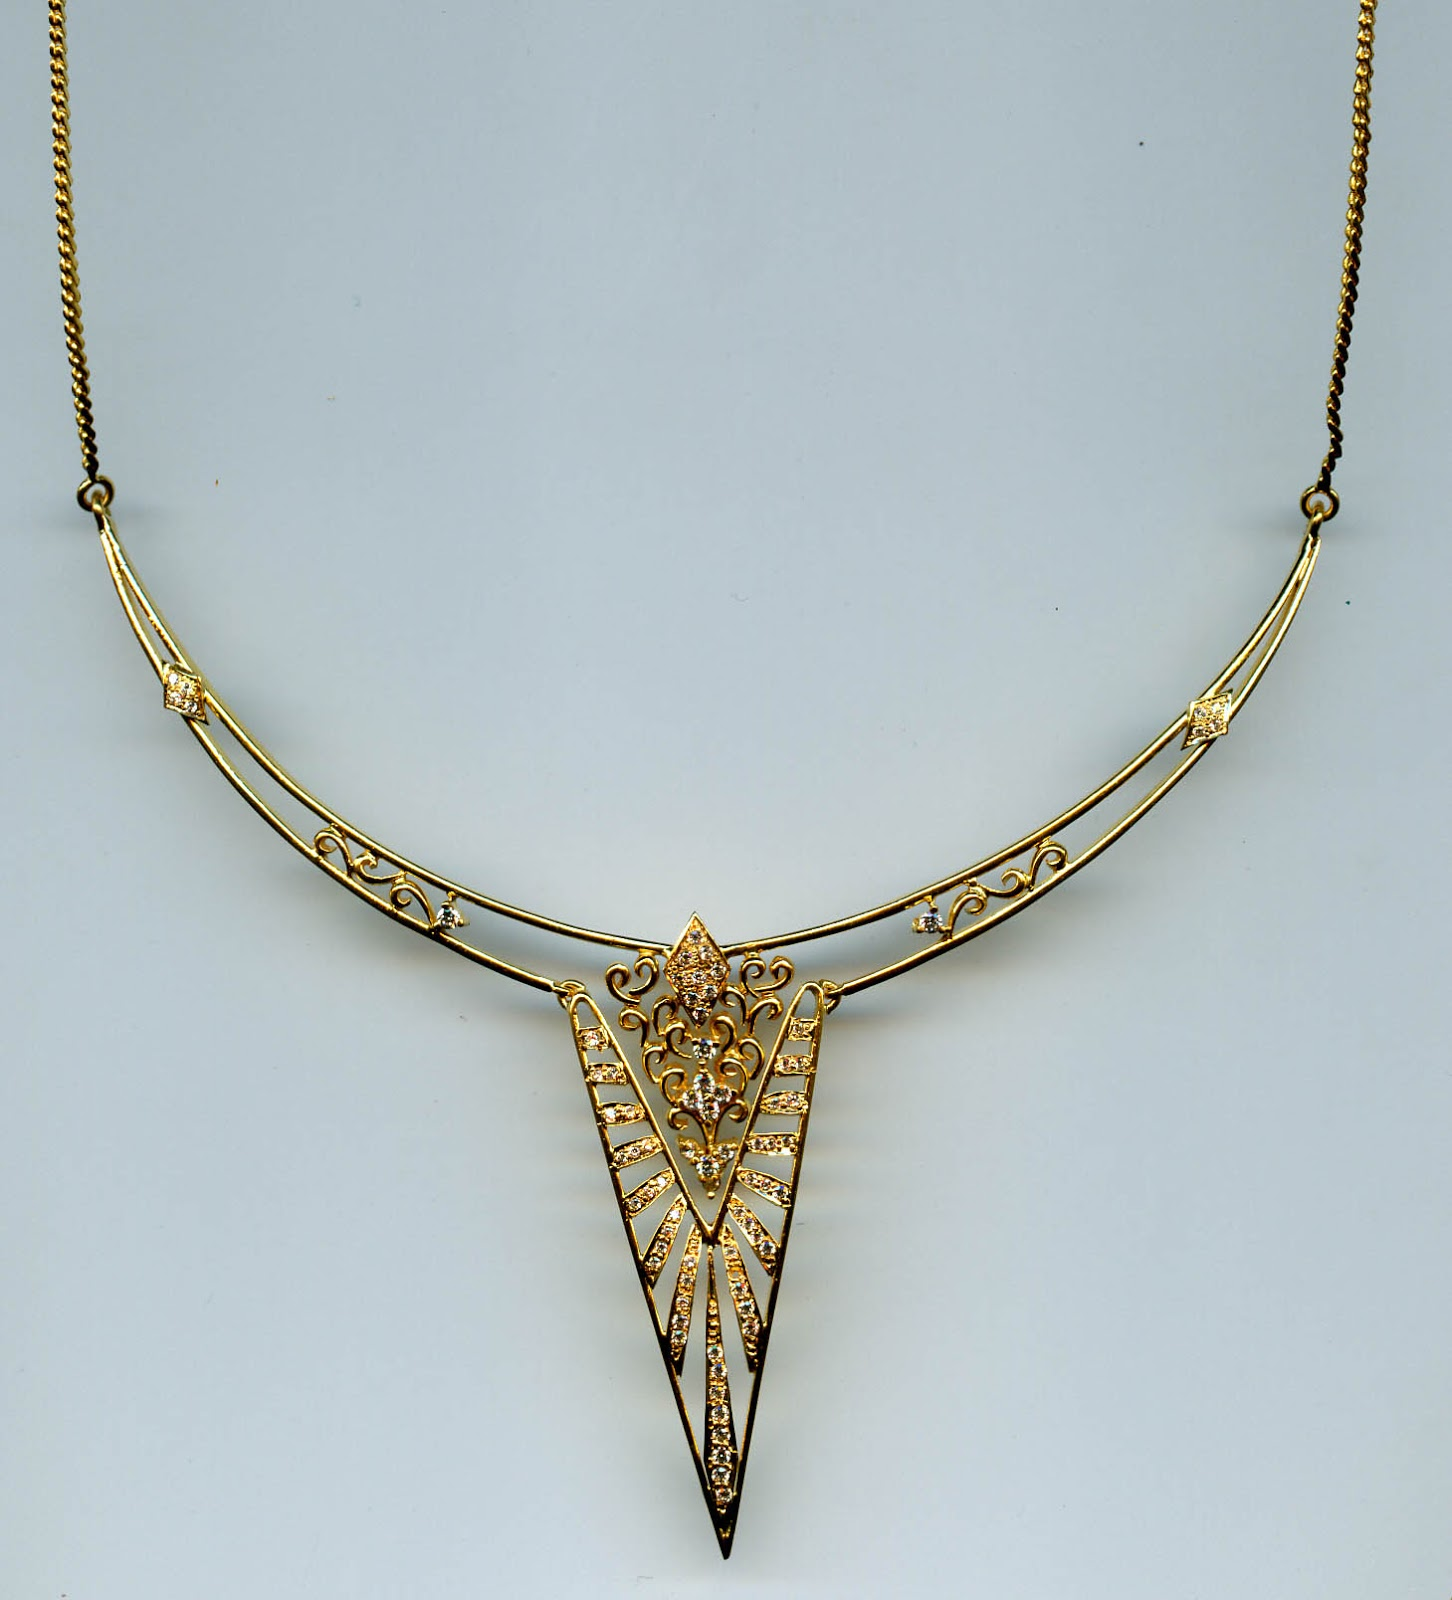 Golden Jewelaries For Life Sri Lanka Gold Jewelry Designs. Half Carat Emerald. Bezel Set Emerald. Instagram Emerald. Smarald Emerald. Pink Star Emerald. Star Shaped Emerald. Talc Isolated Emerald. Silicate Emerald